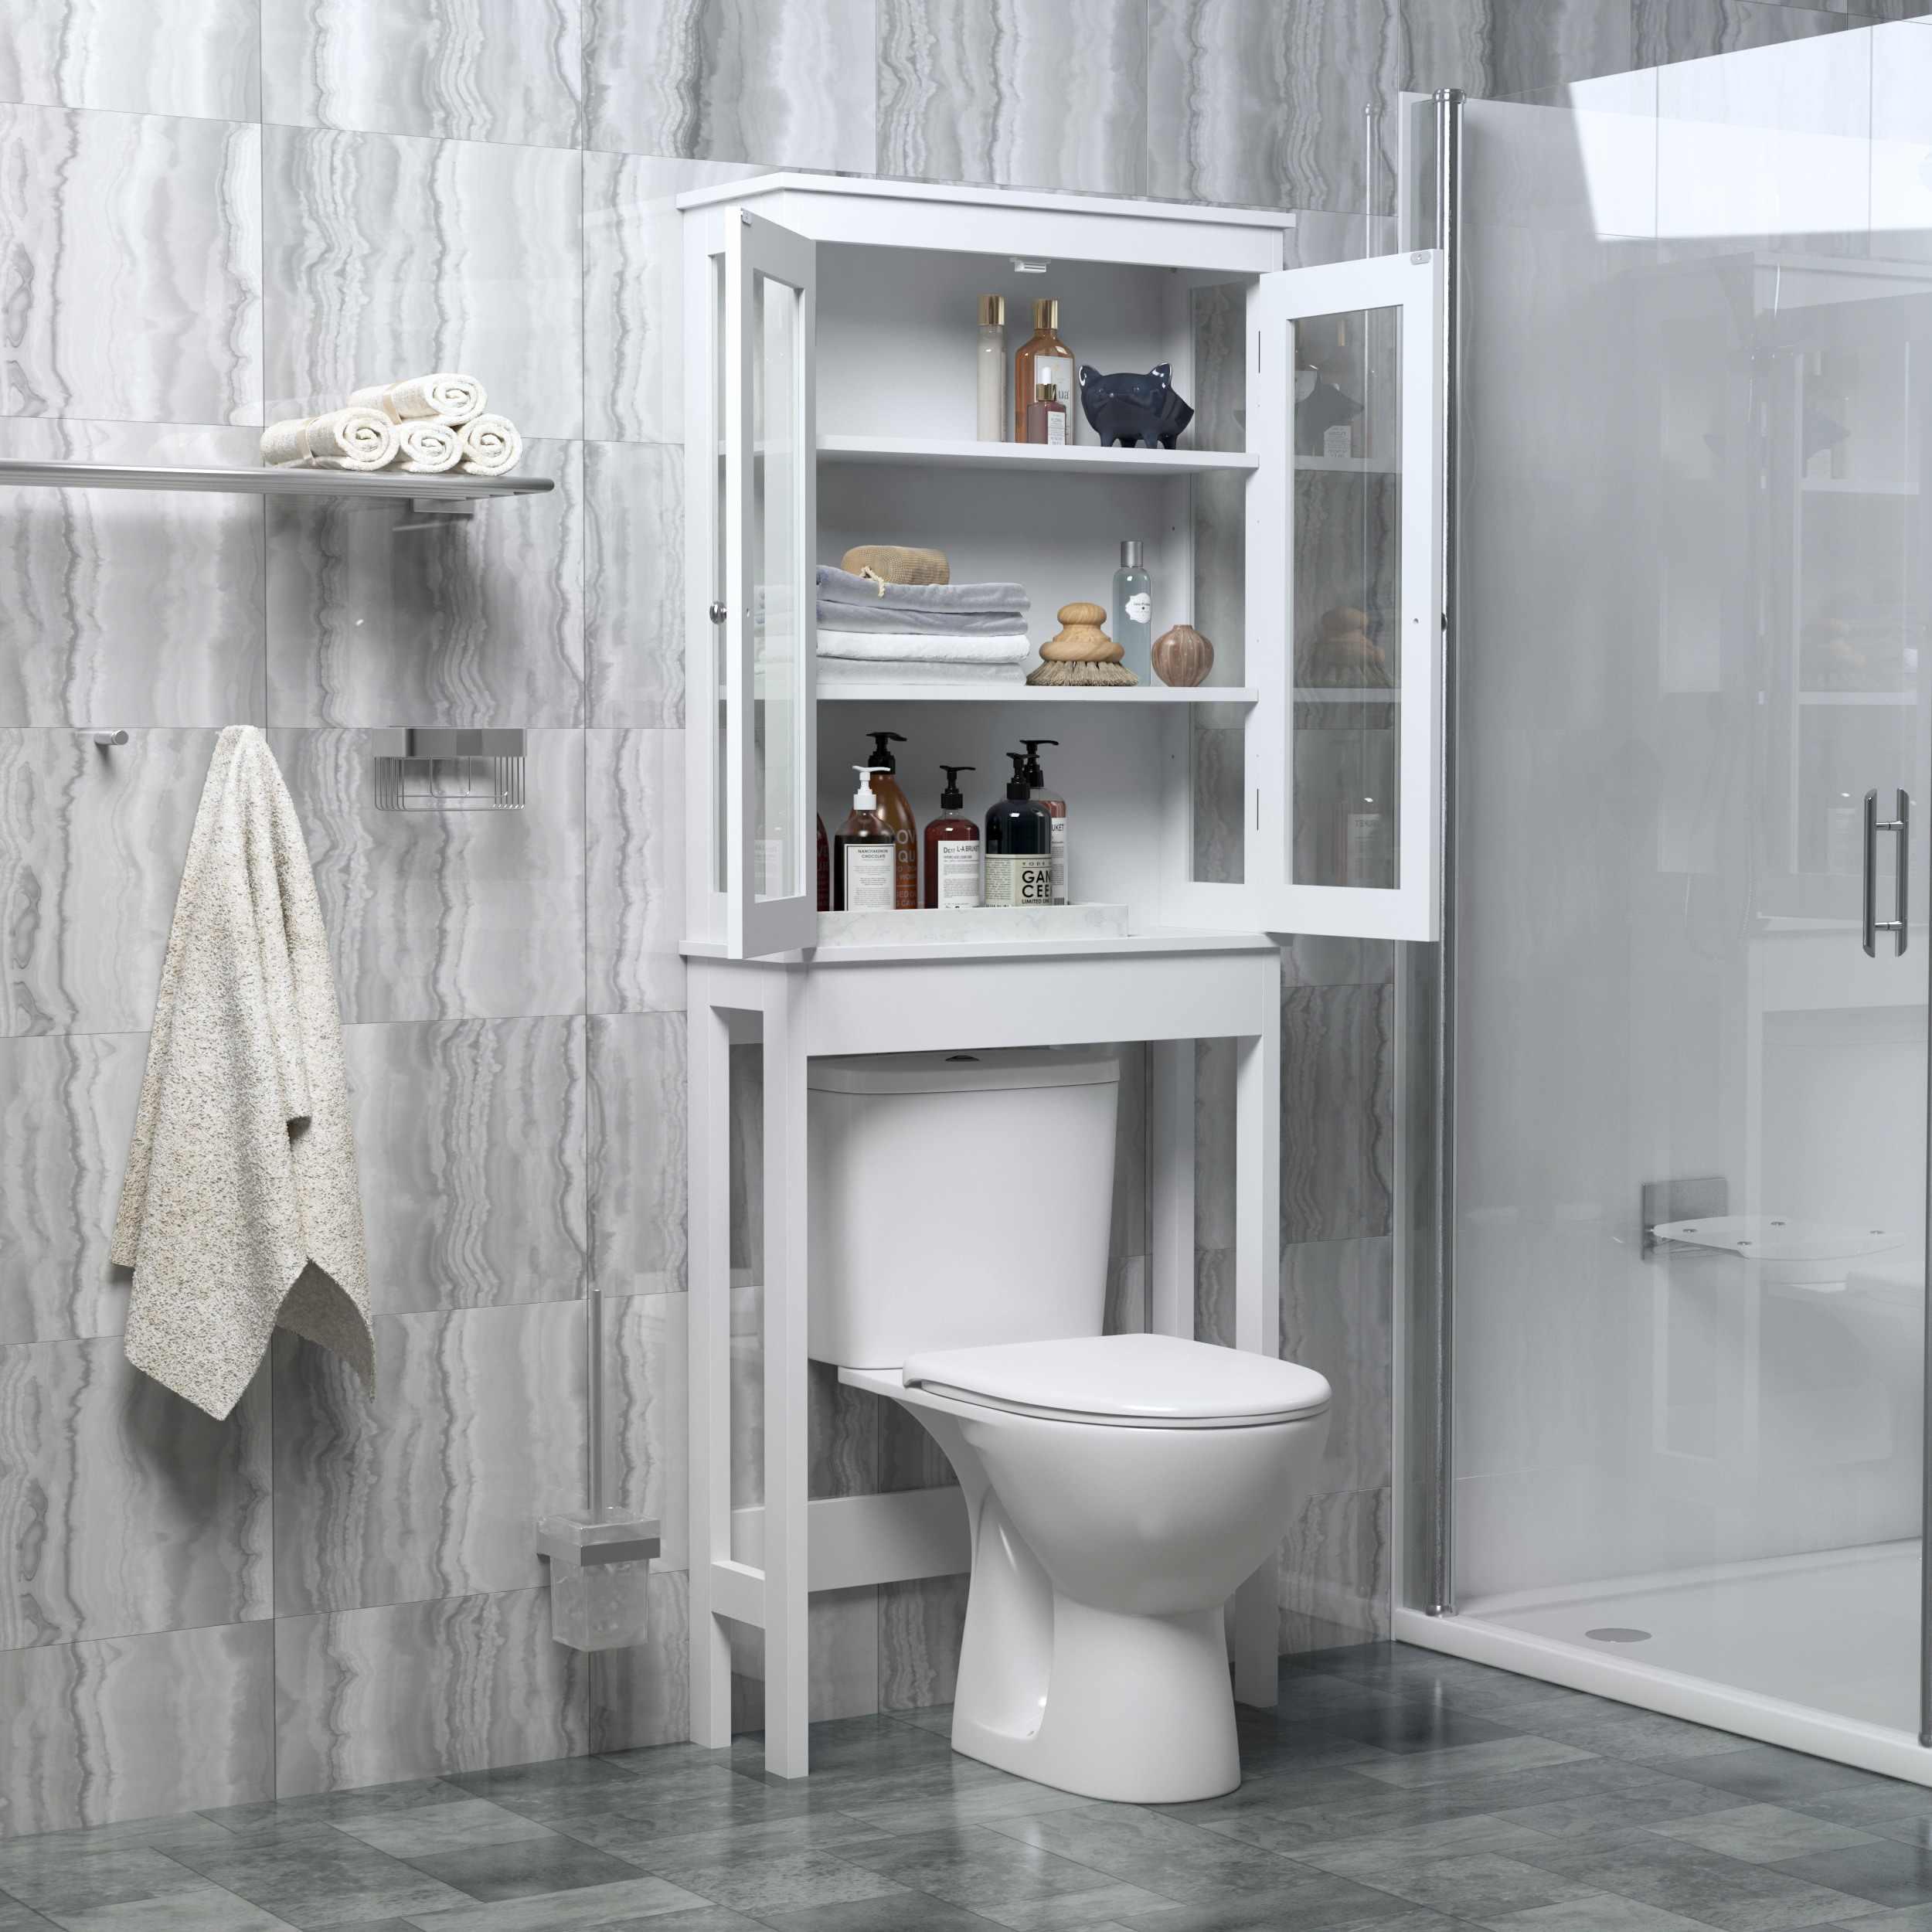 66*22*165cm Over The Toilet Storage Cabinet Bathroom Shelves Organizer Space Saver Bath Rack